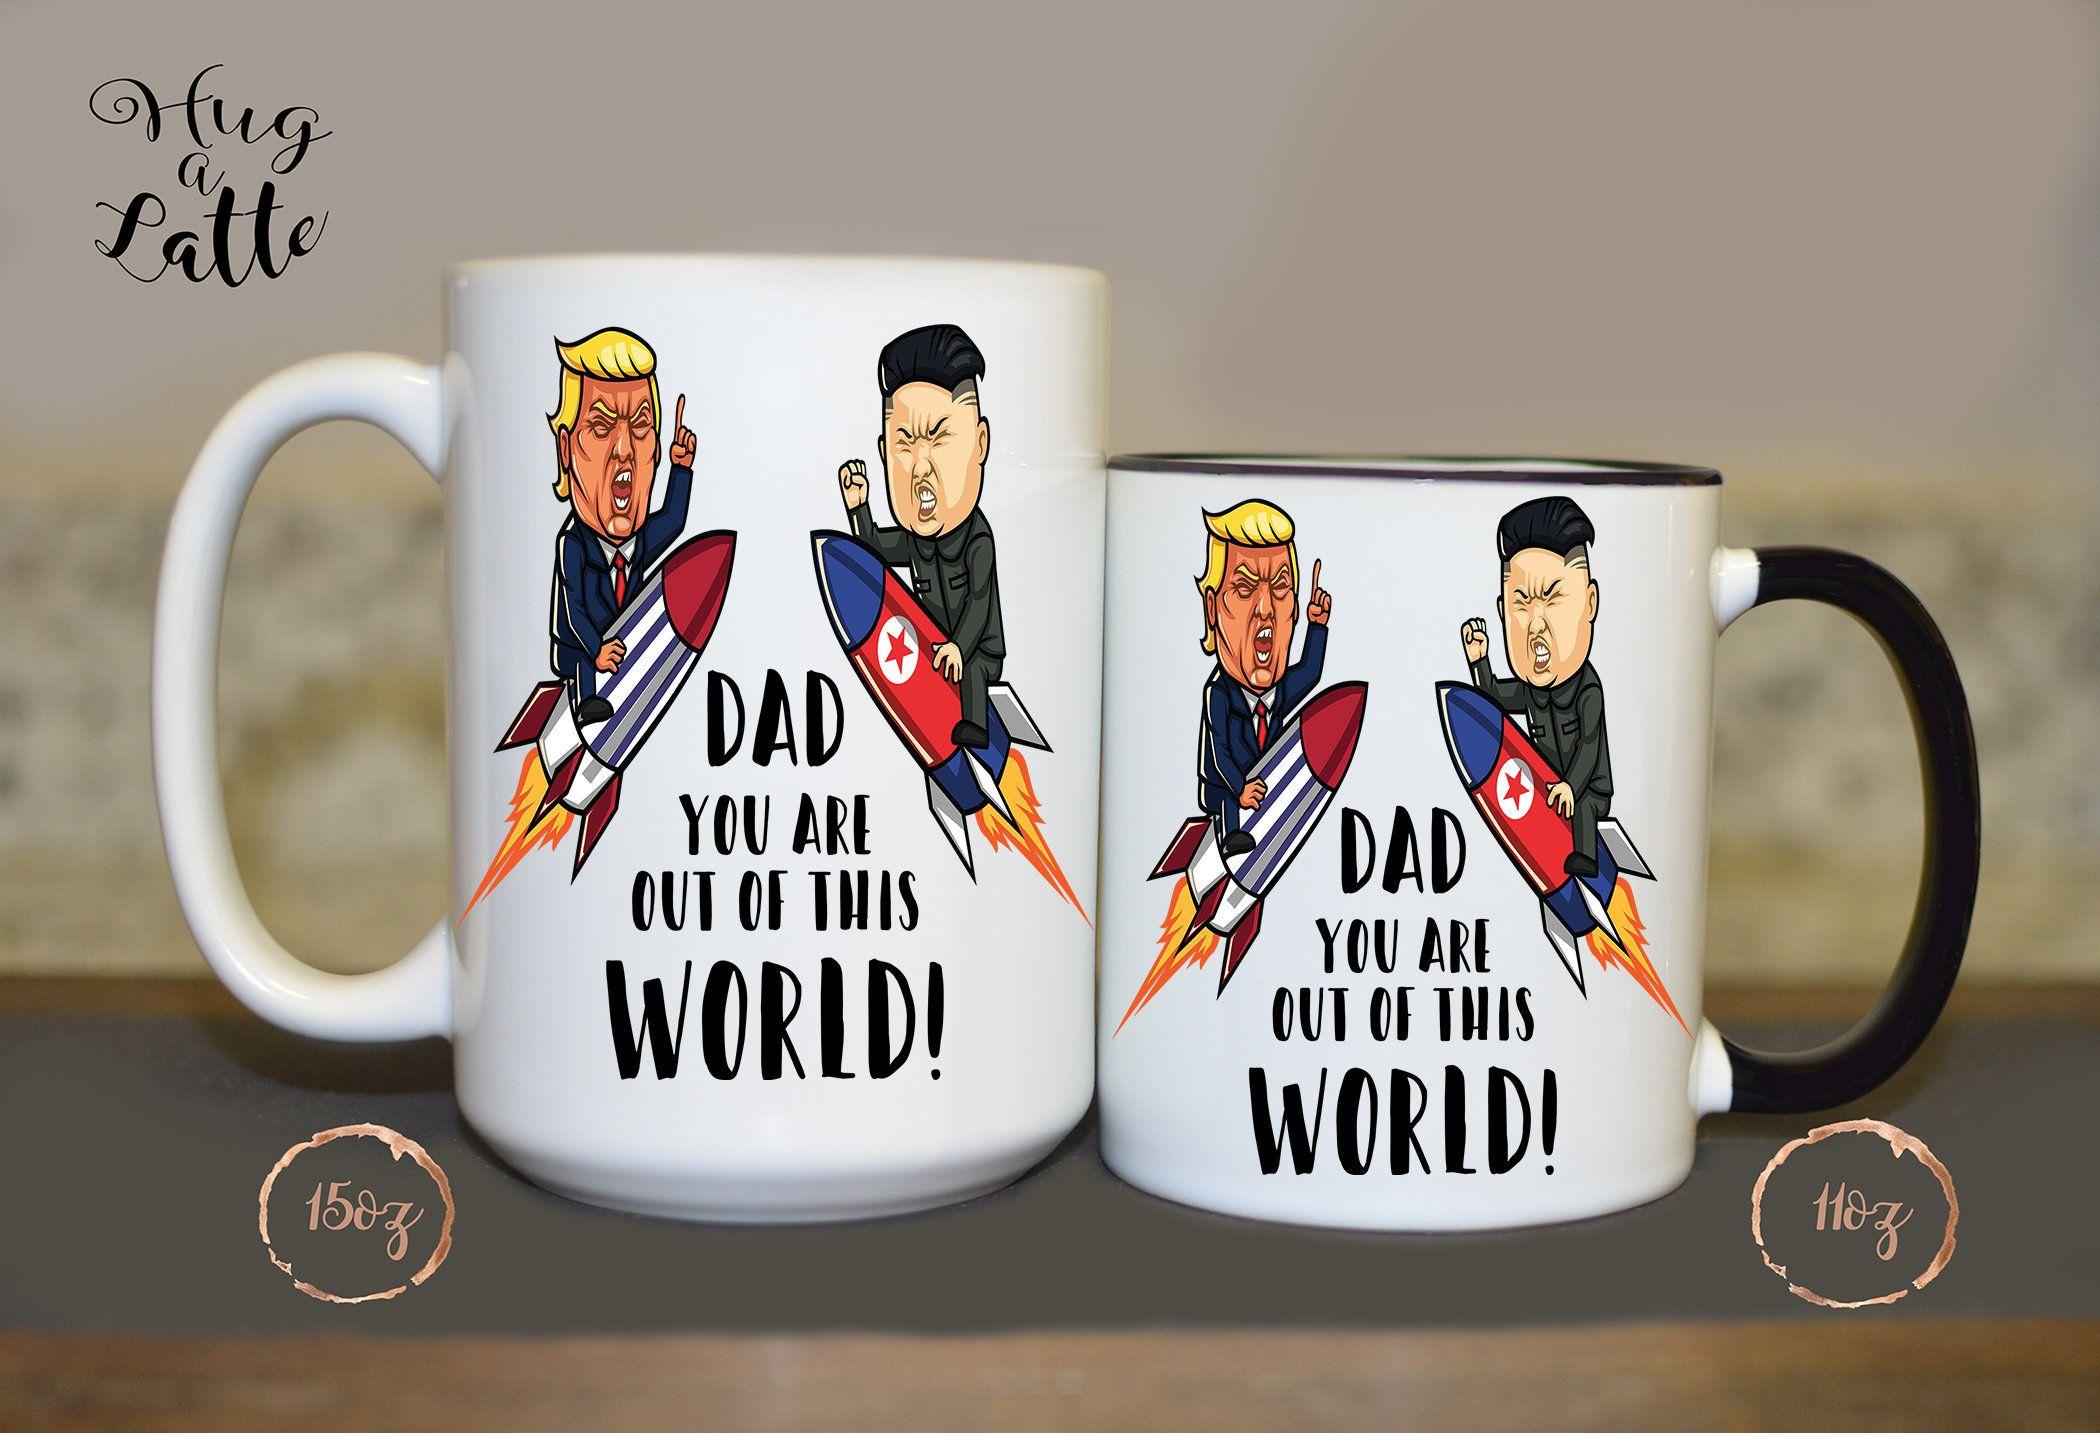 641bbc56f26 Trump Mug, Donald Trump Father's Day Gift, Funny Trump Mug, Trump Birthday  Gift, Mug for Dad, Papa, Funny Mug, Anti Trump, Best Father's Day by ...